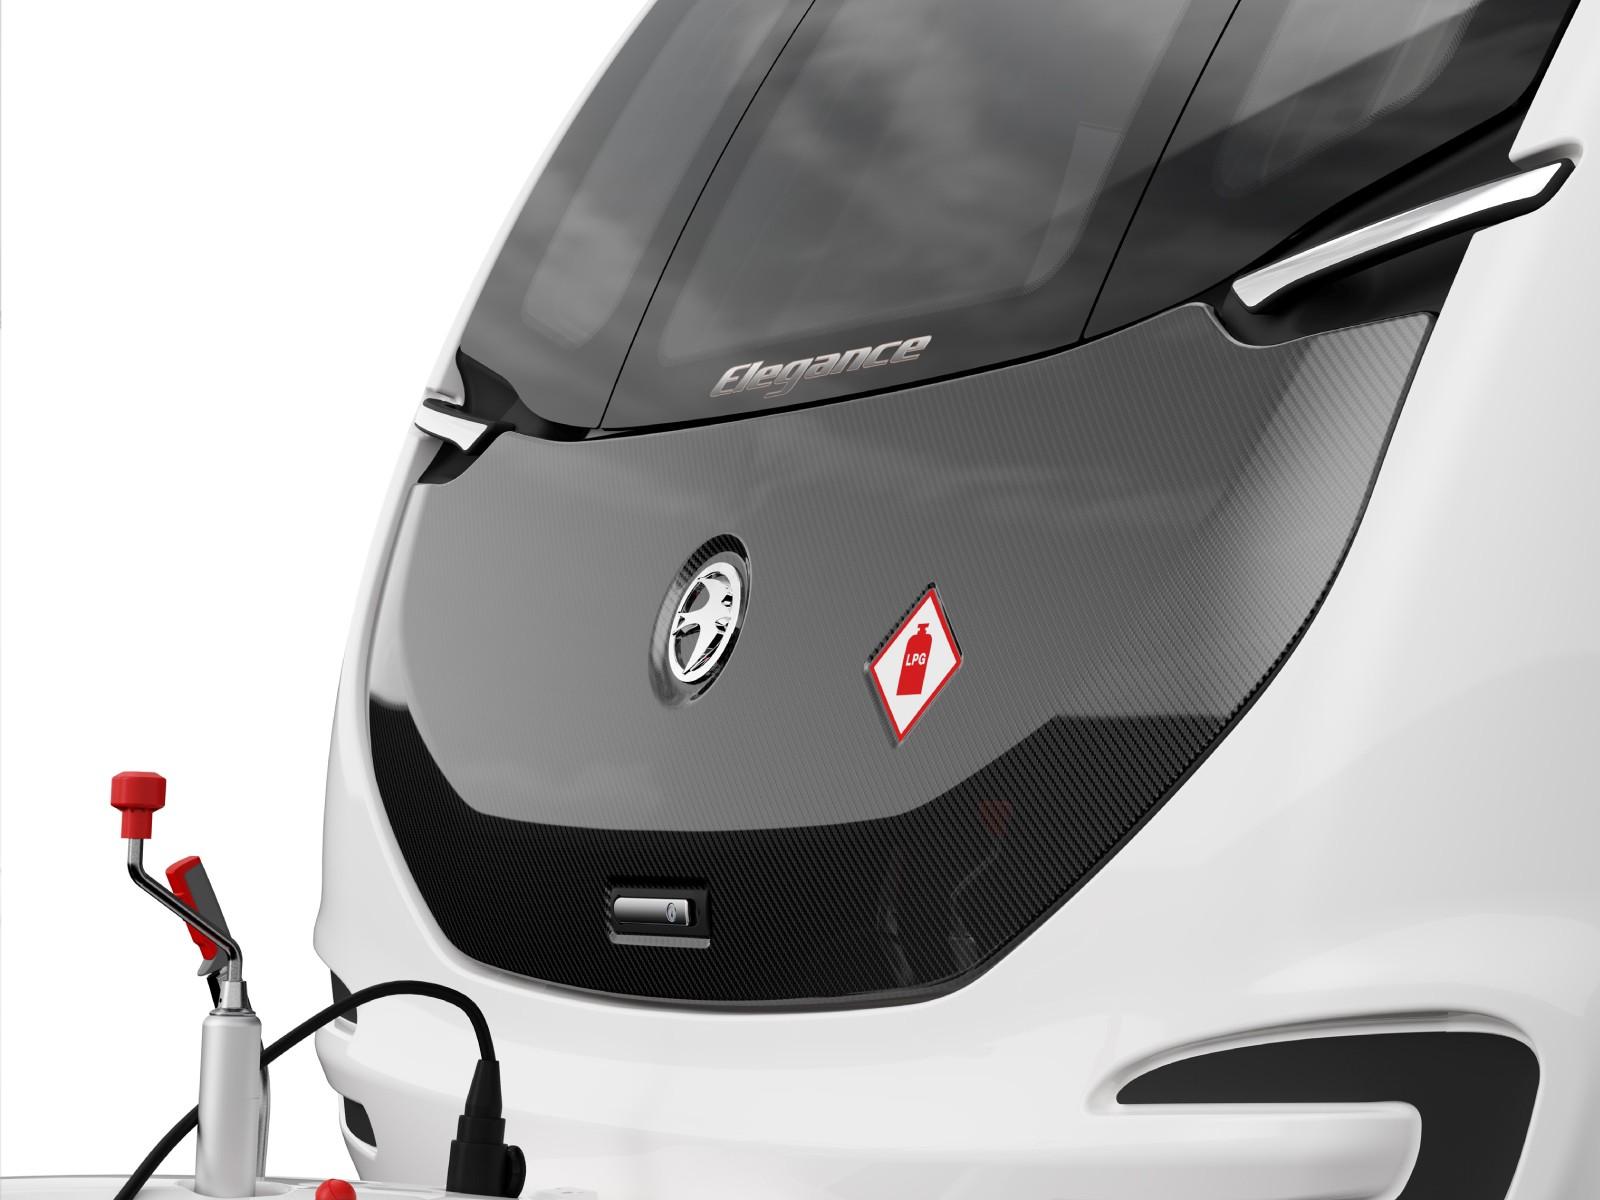 Swift Caravans Elegance External Front Image